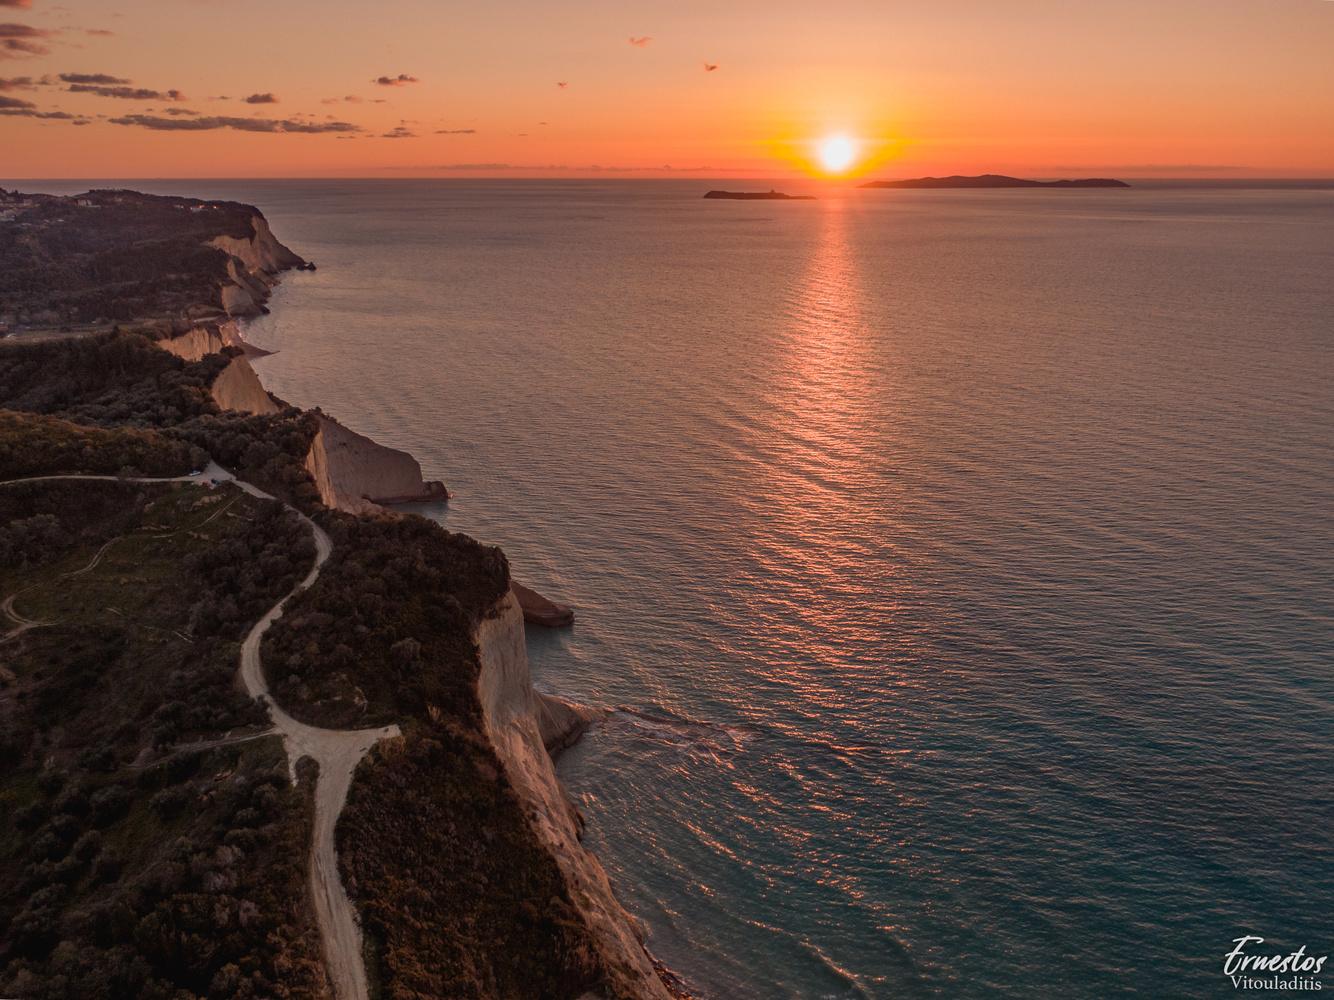 cape drastis sunset corfu by ernestos vitouladitis